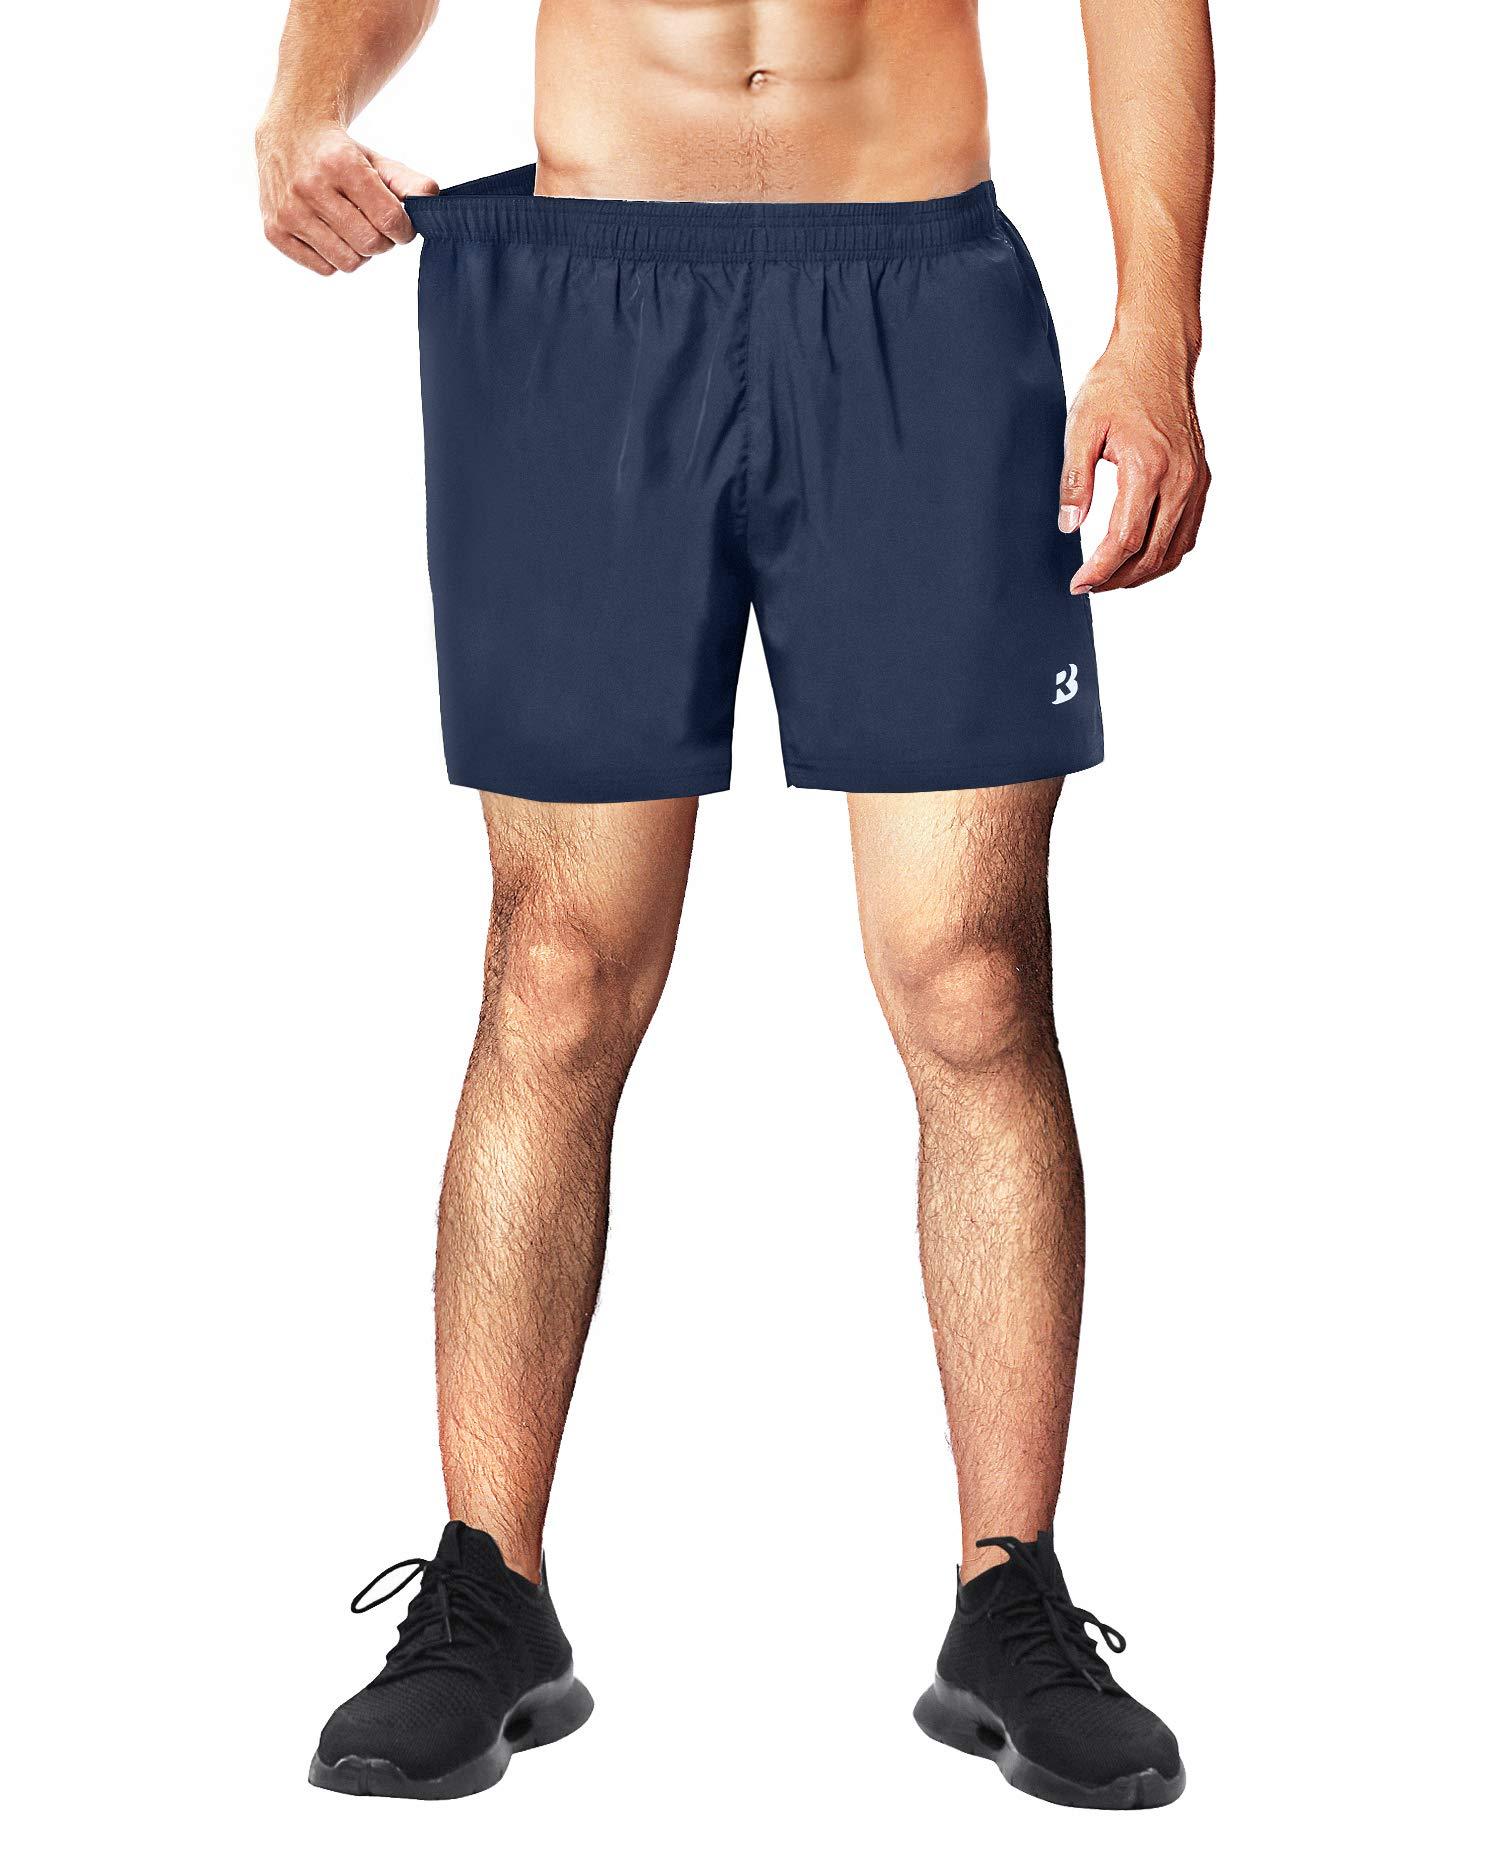 Roadbox Running Athletic Workout Traning